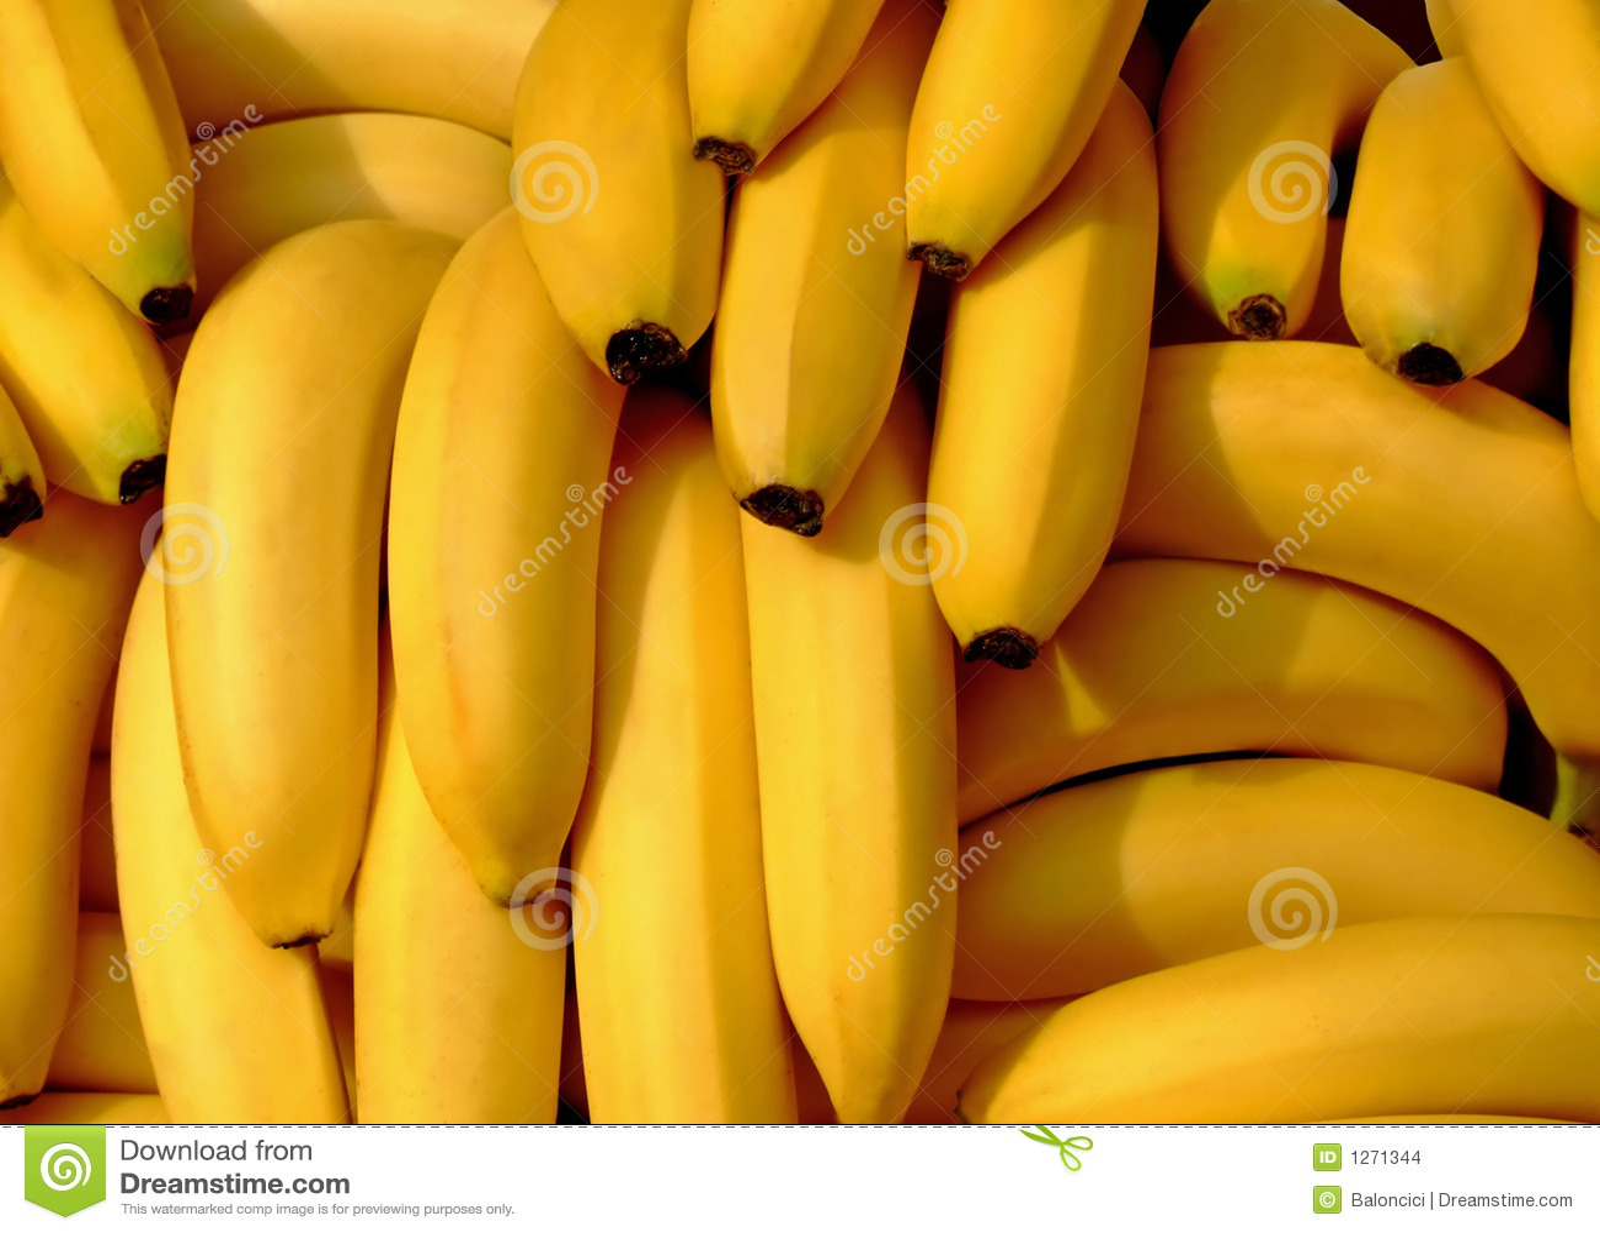 Bananas pile